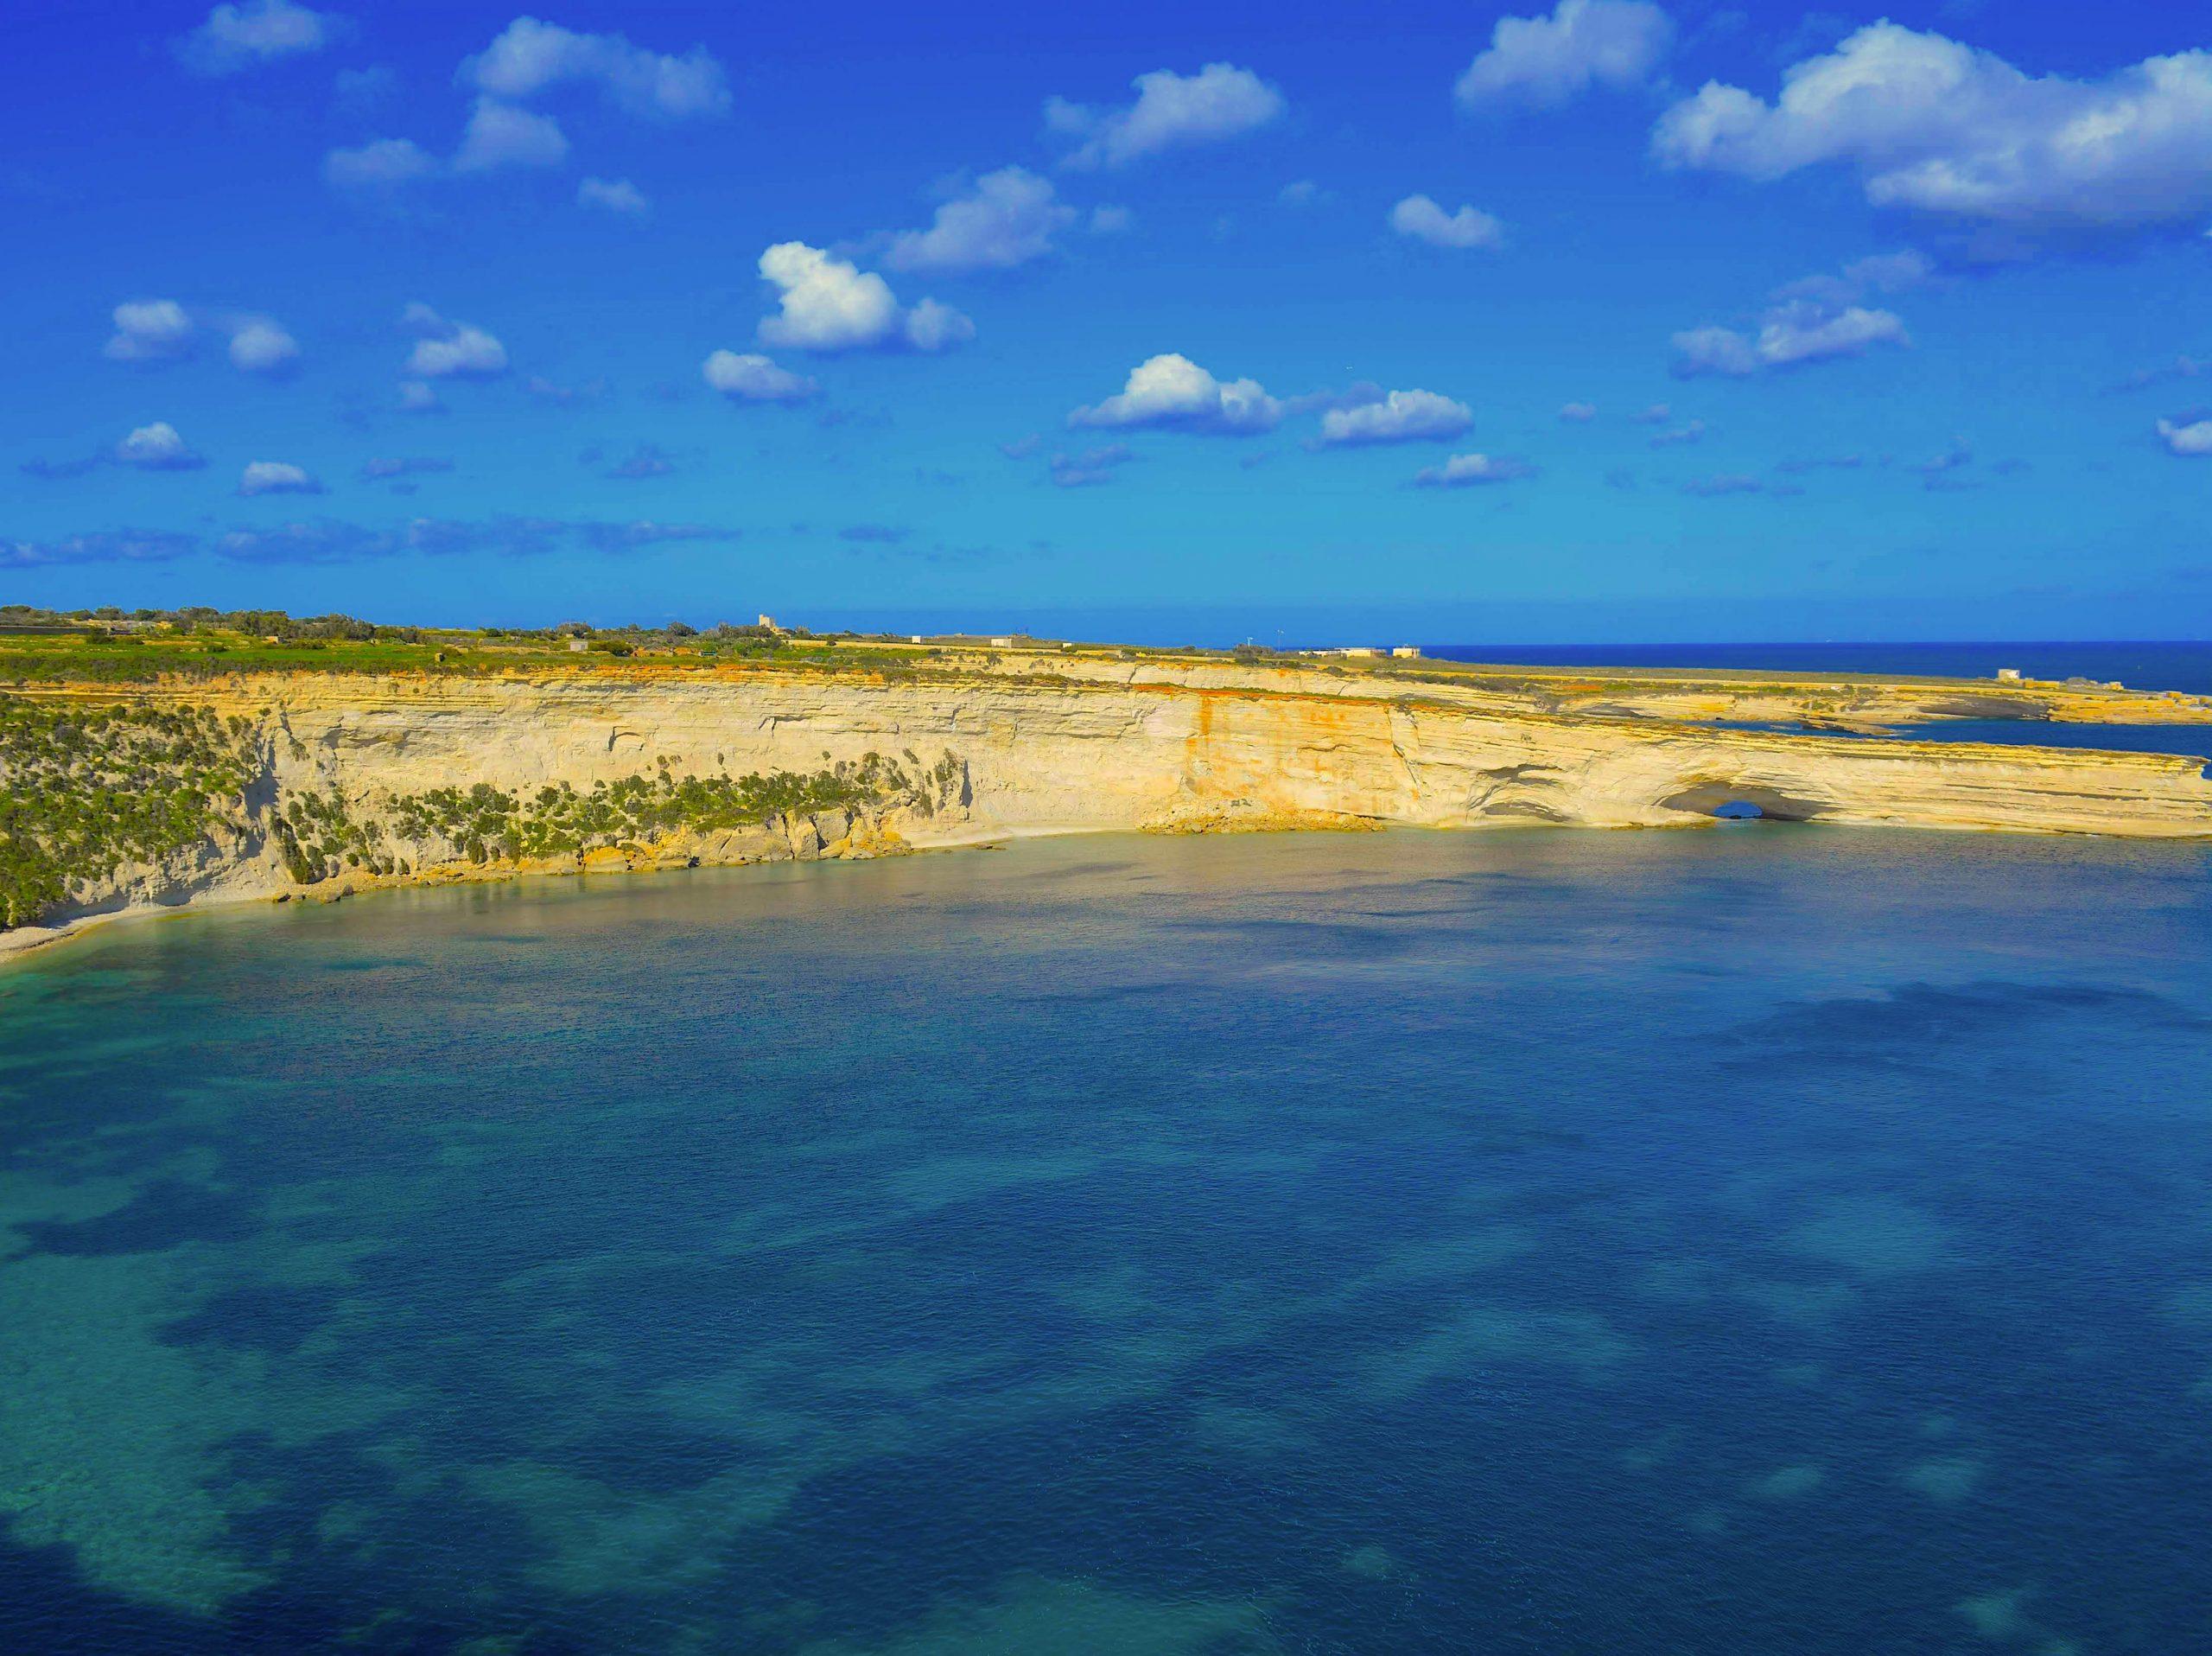 Cliff edge and bright blue sea below